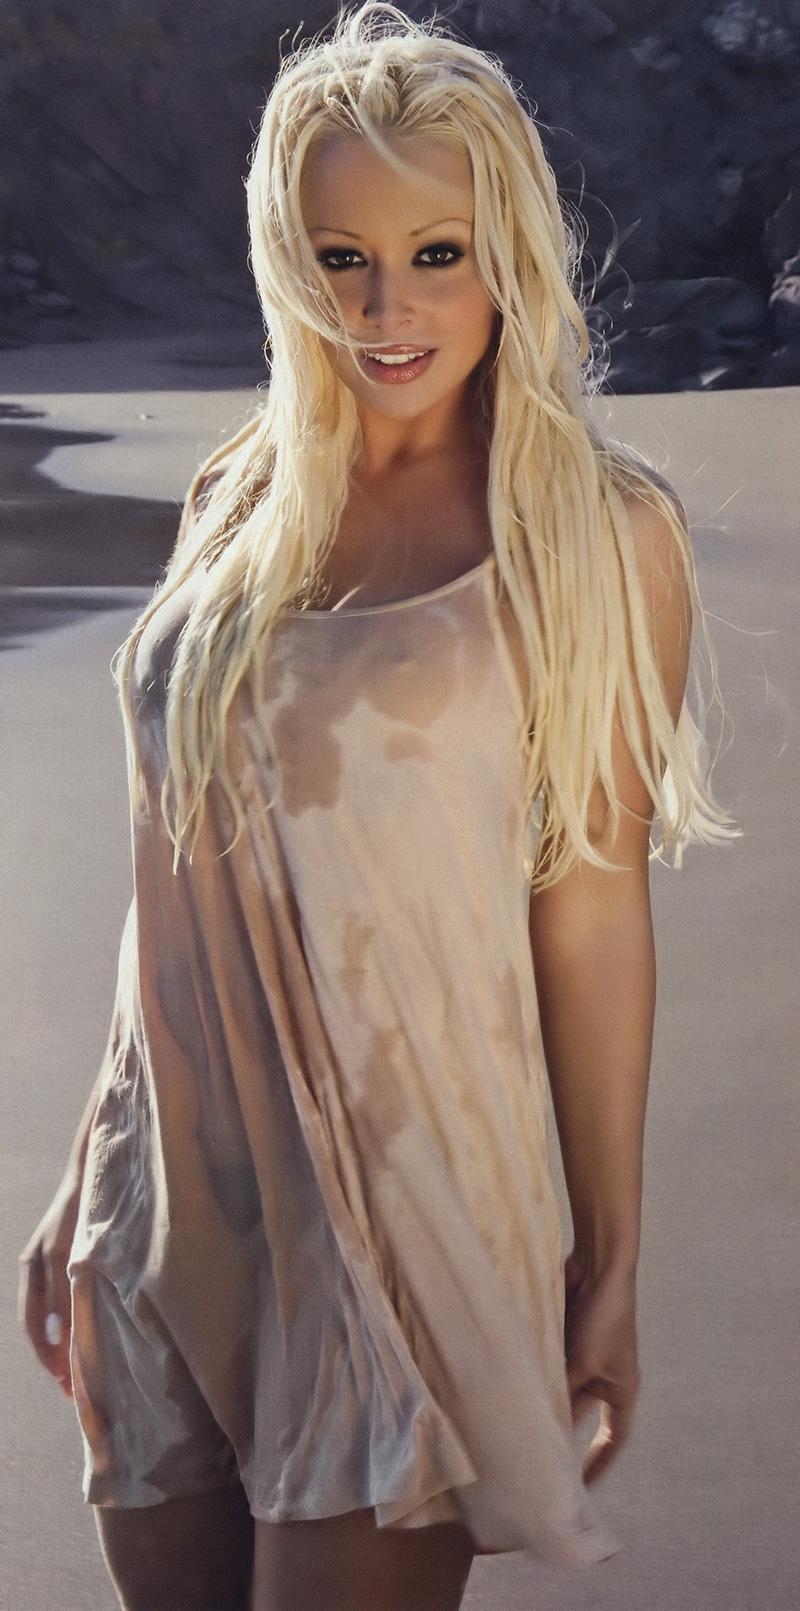 Даниэла Катценбергер голая. Фото - 51